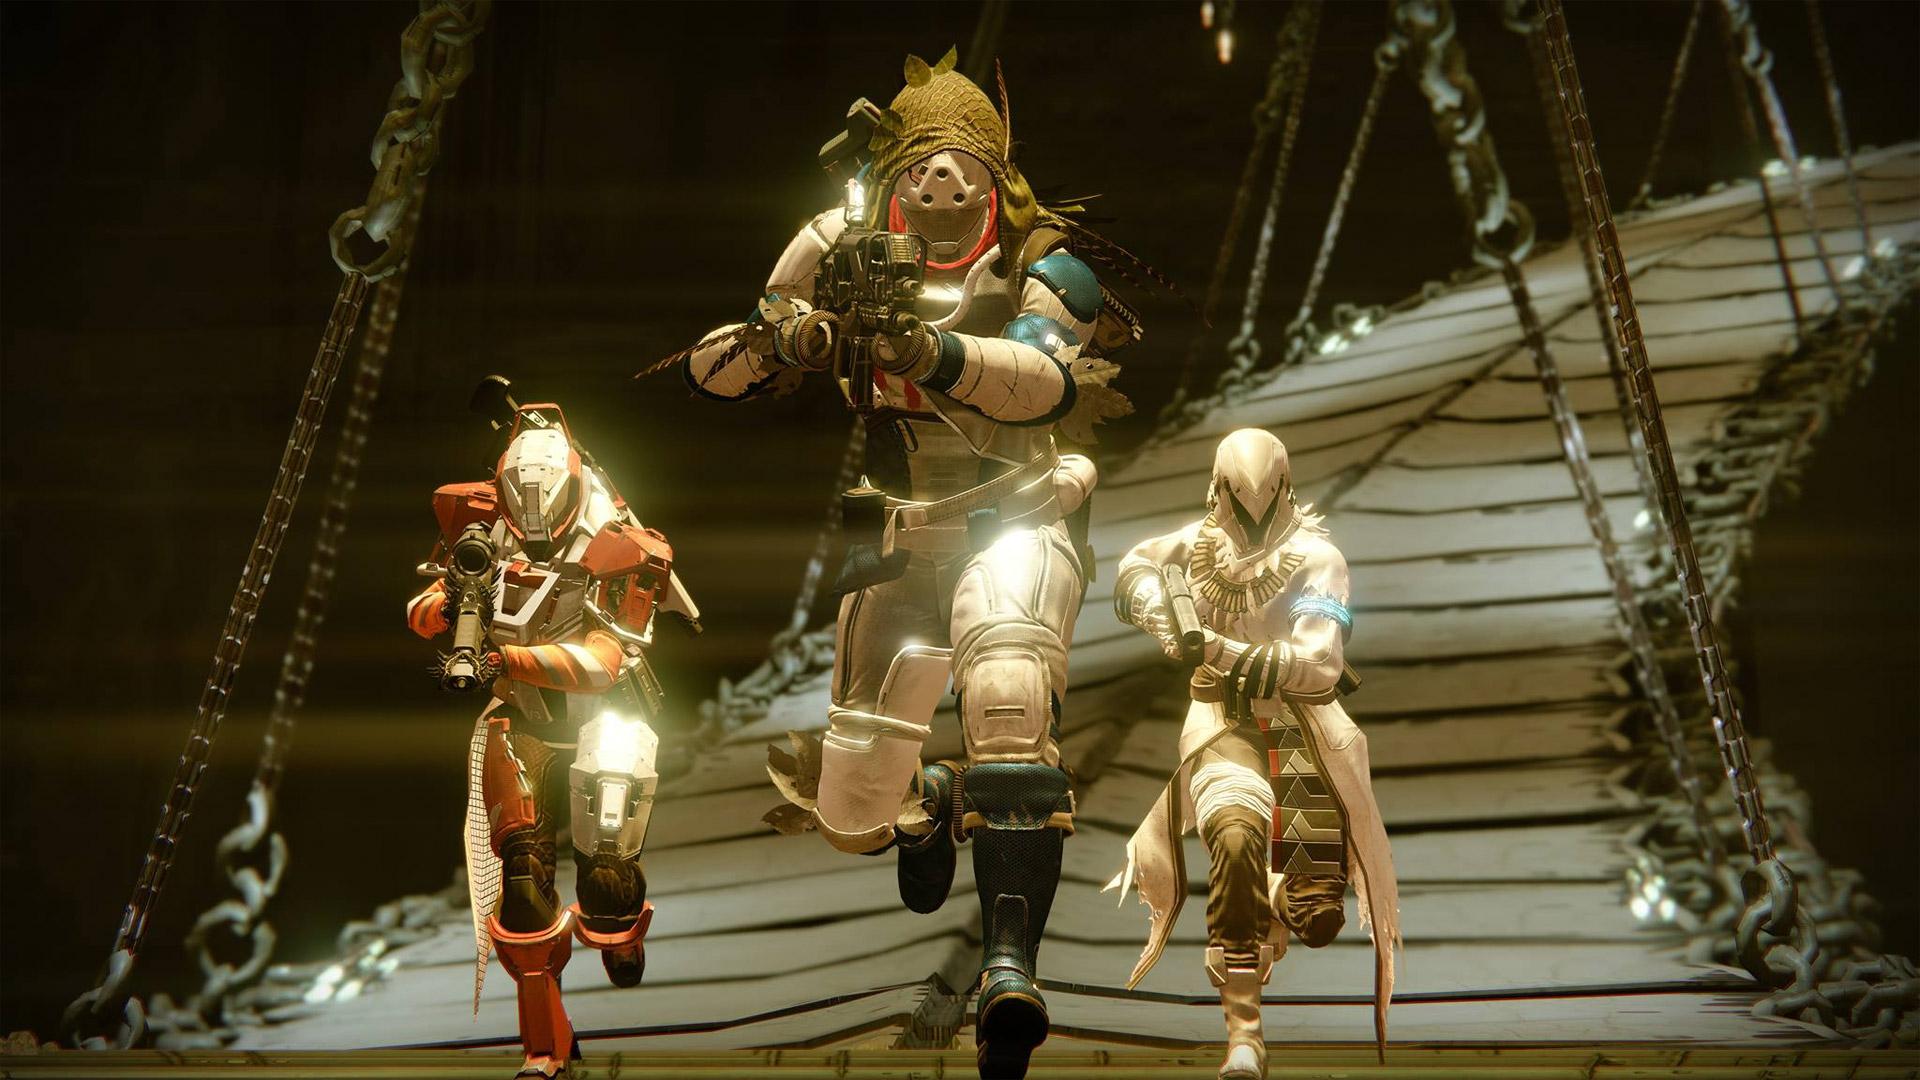 Destiny 1's community is alive, raiding, and hesitant to move on